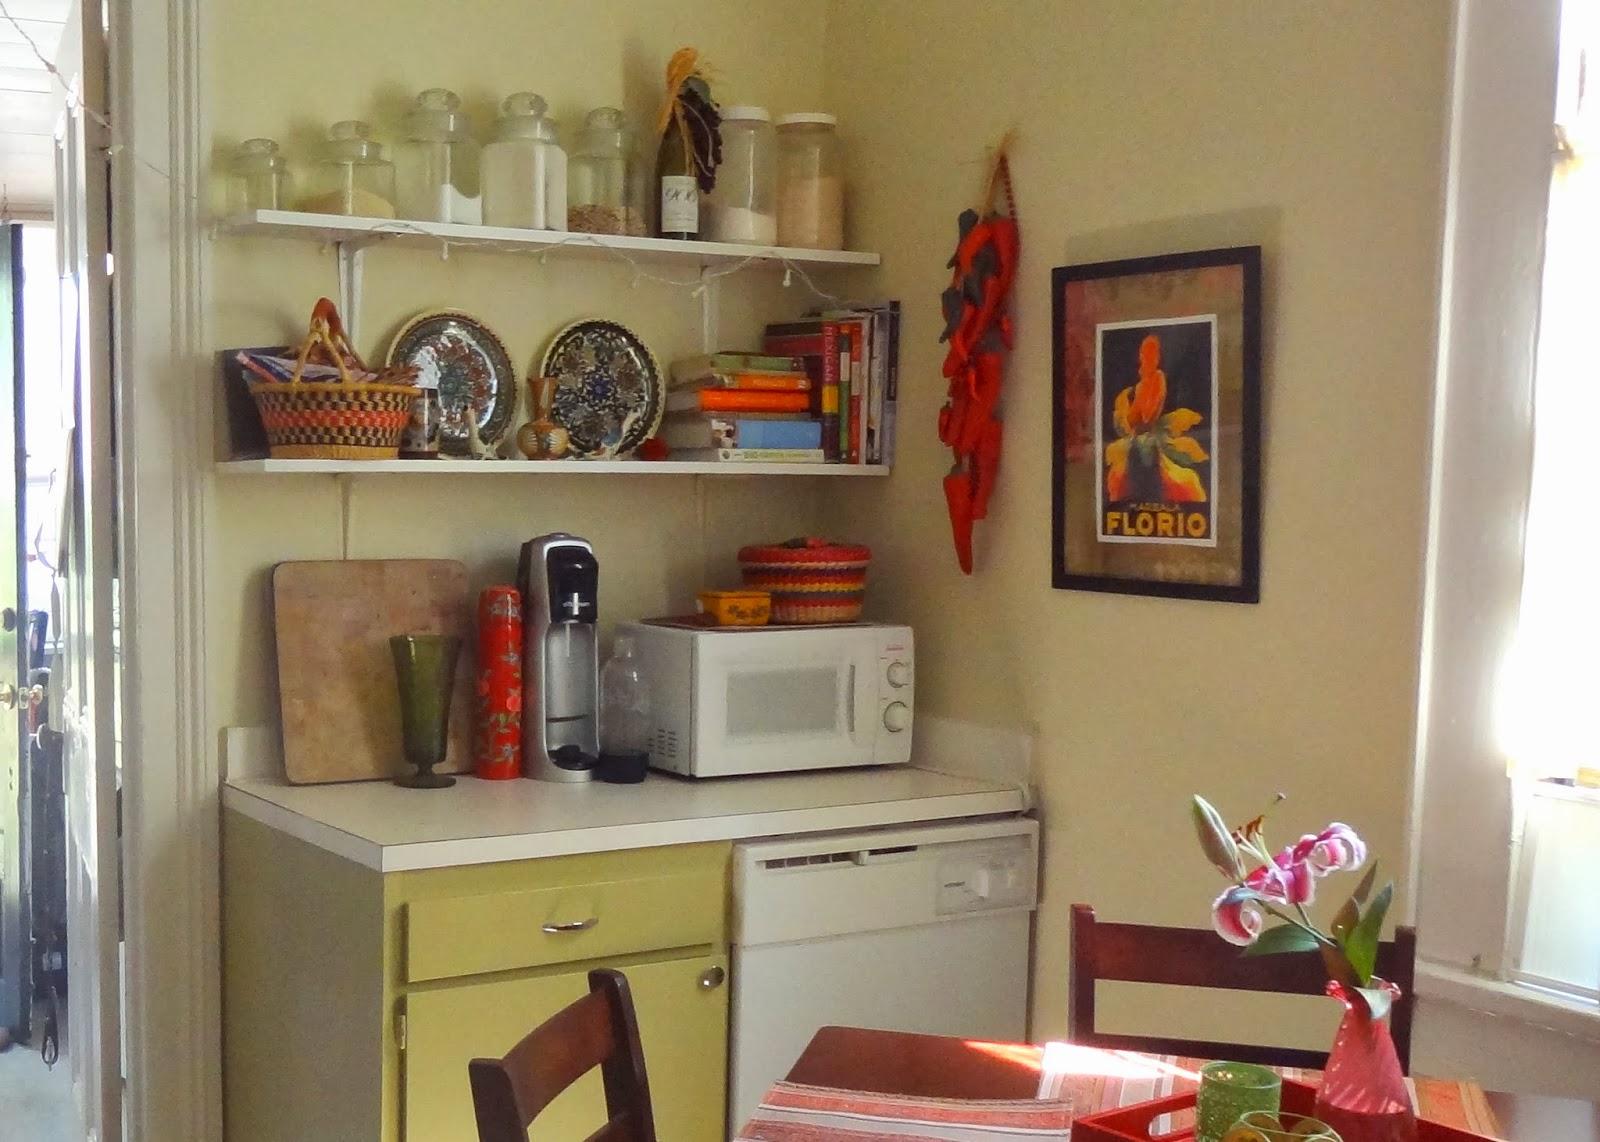 GYPSY YAYA: Open Shelvin\' In The Kitchen & Other Rental Kitchen Ideas